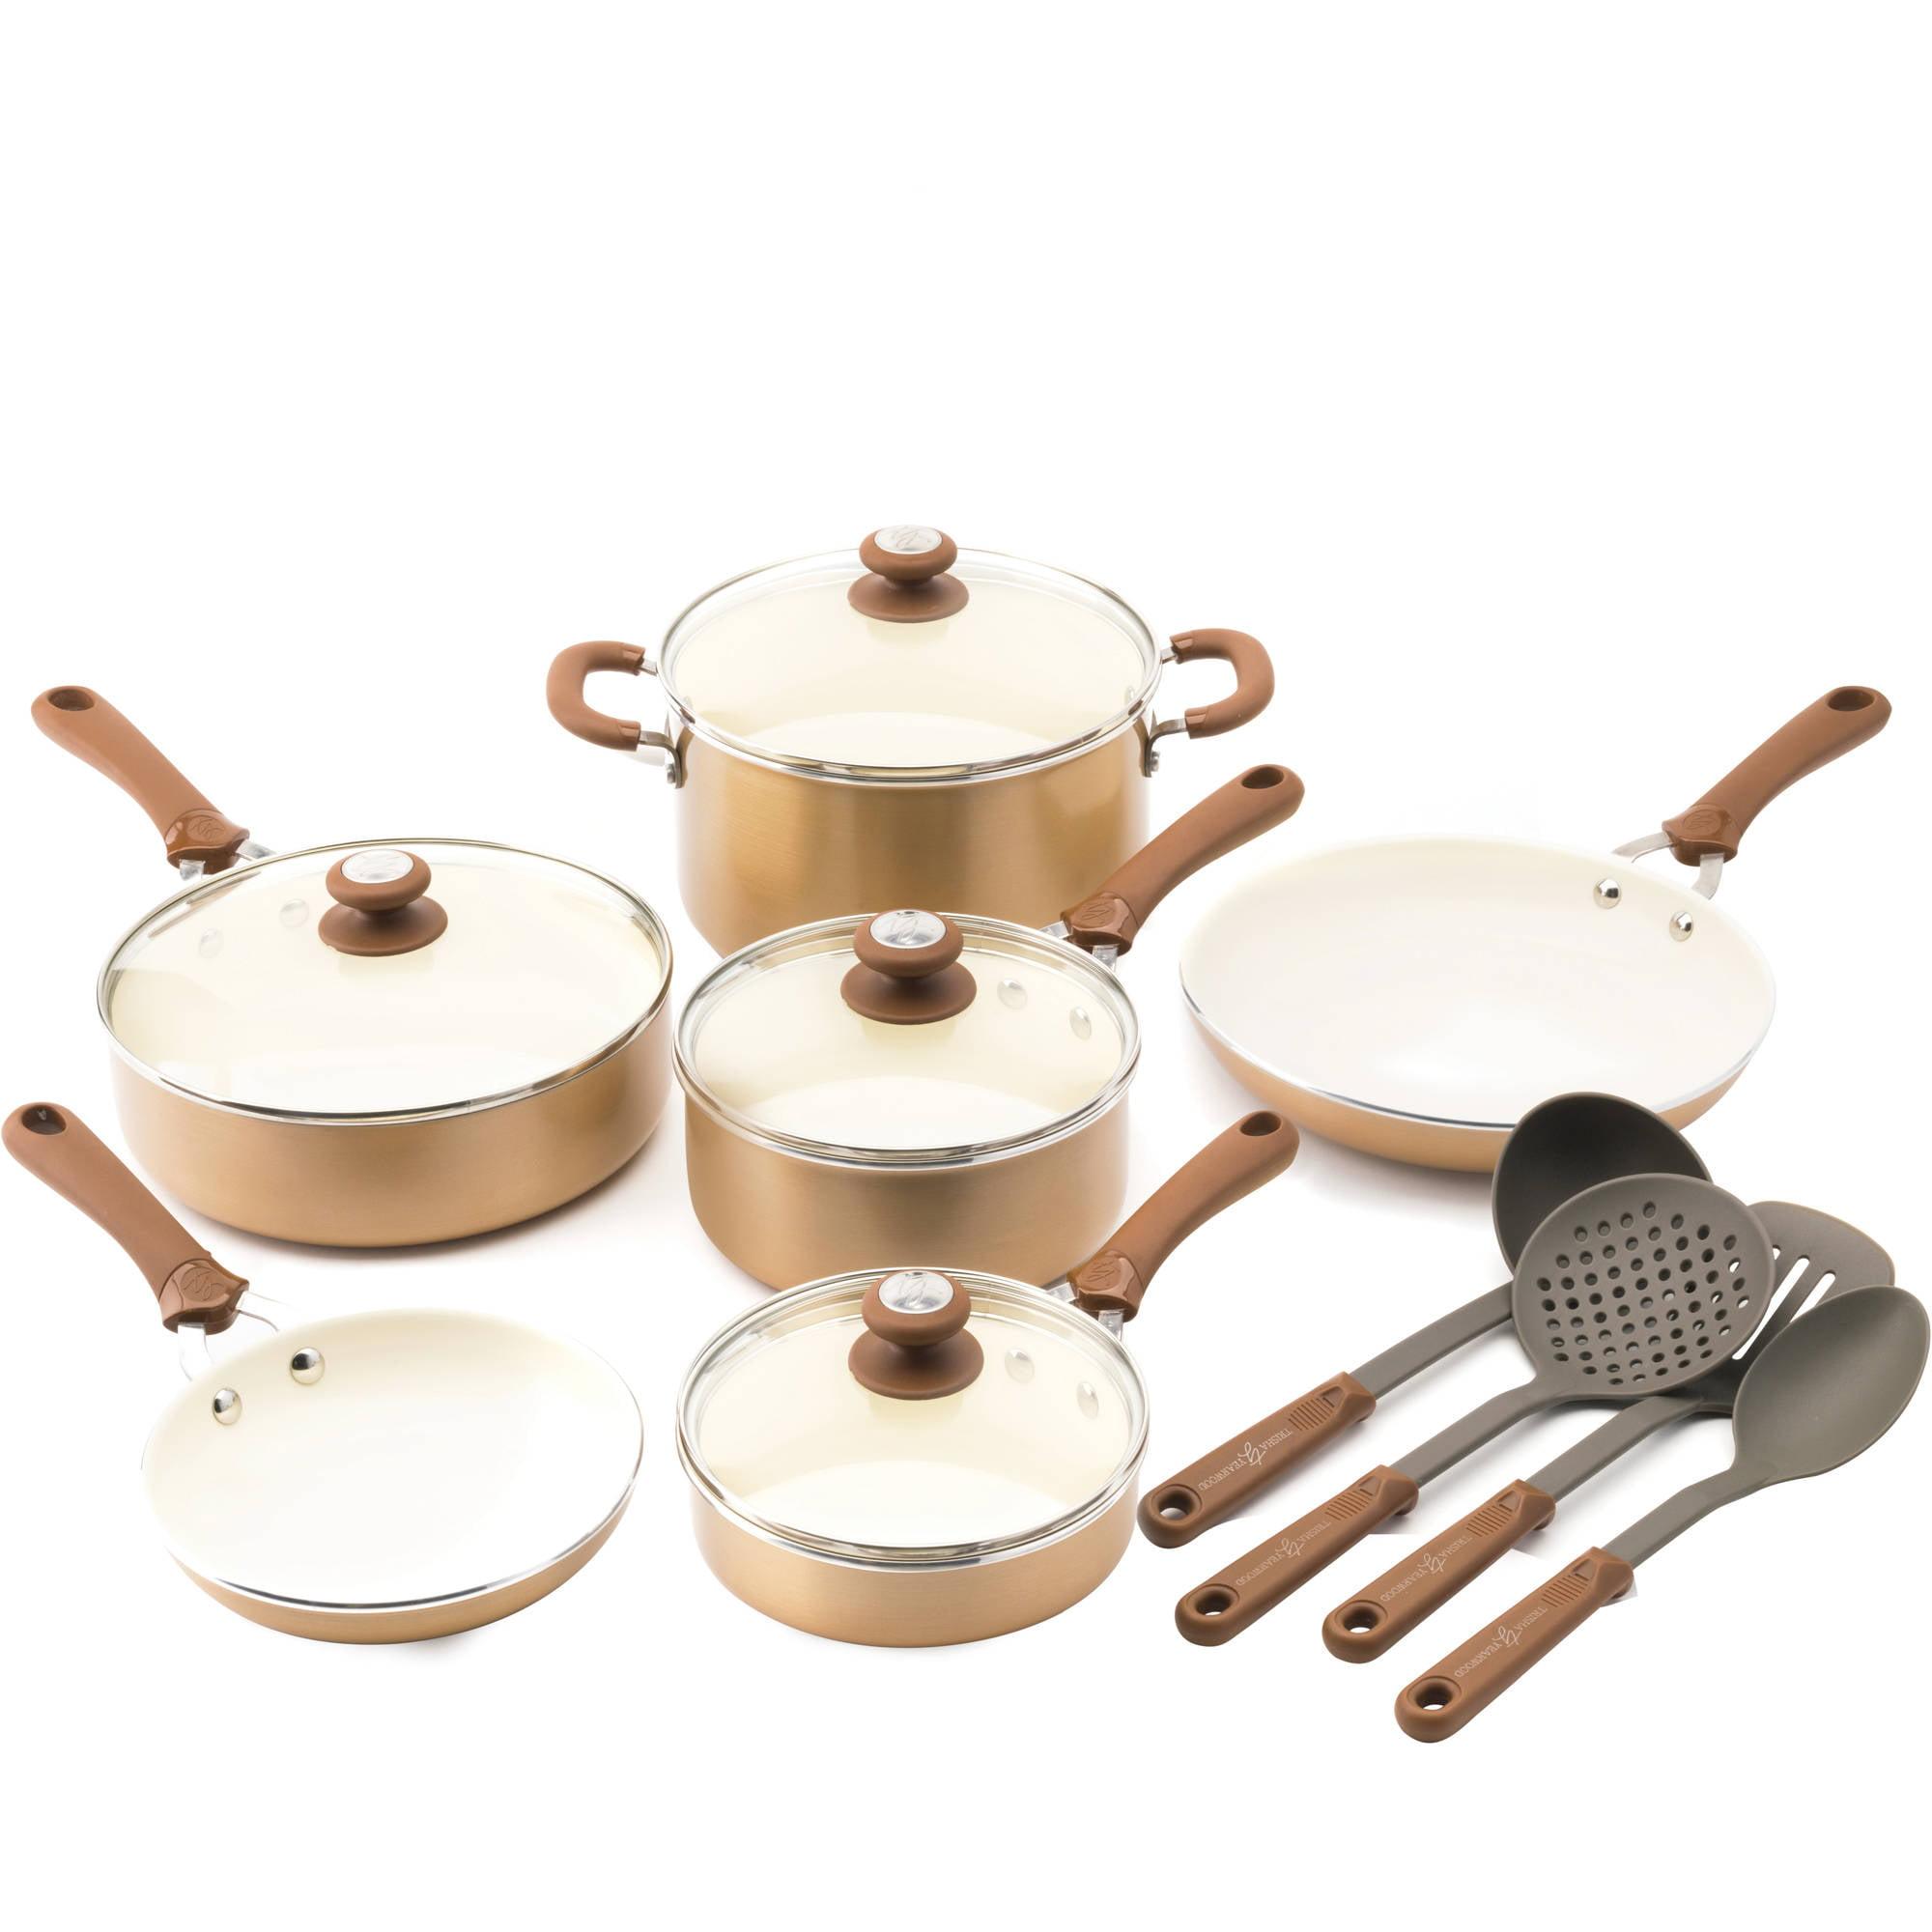 trisha yearwood precious metals aluminum nonstick ceramic 14piece cookware set walmartcom